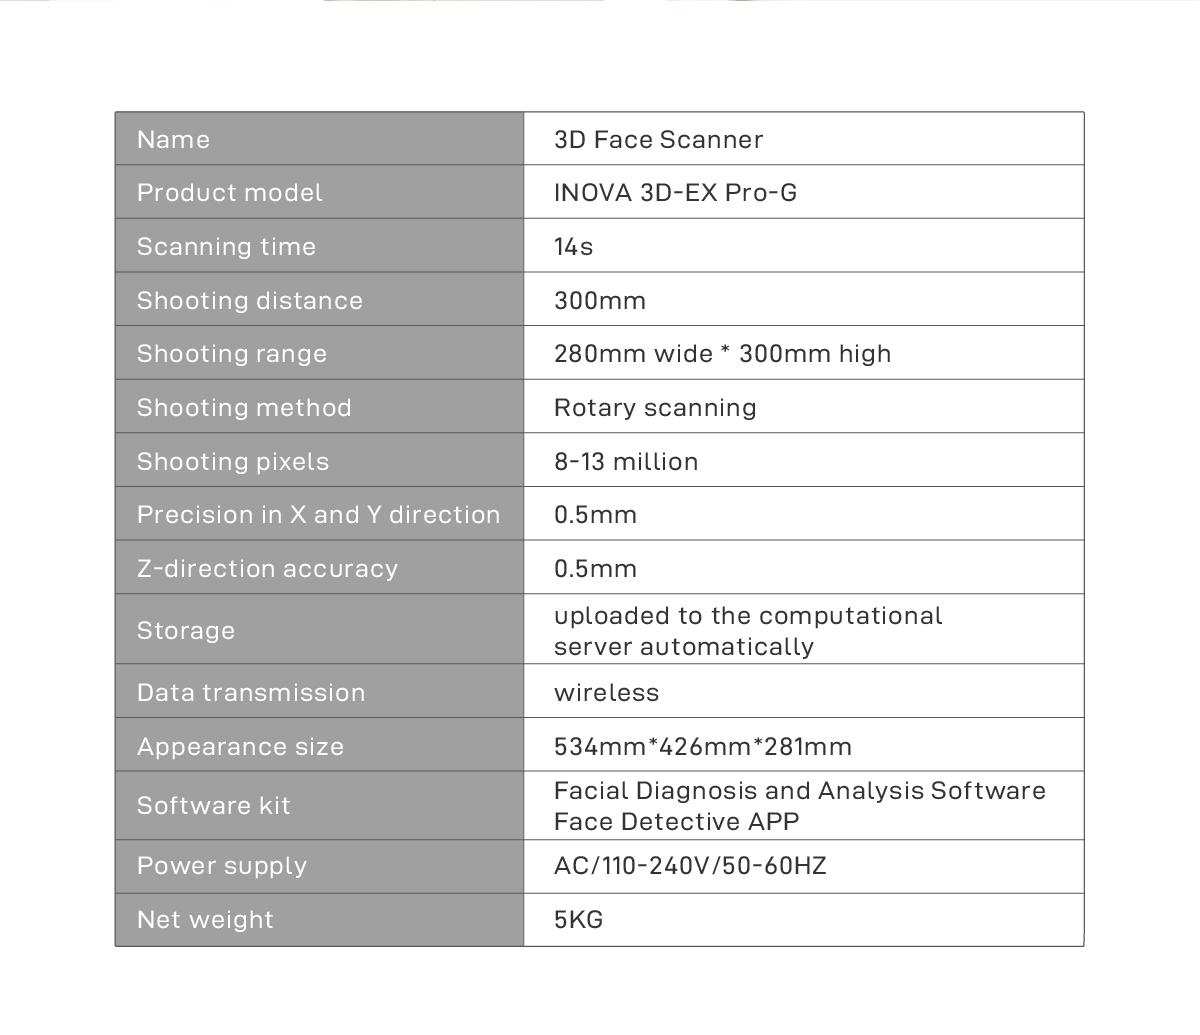 INOVA 3D-EX Pro-G